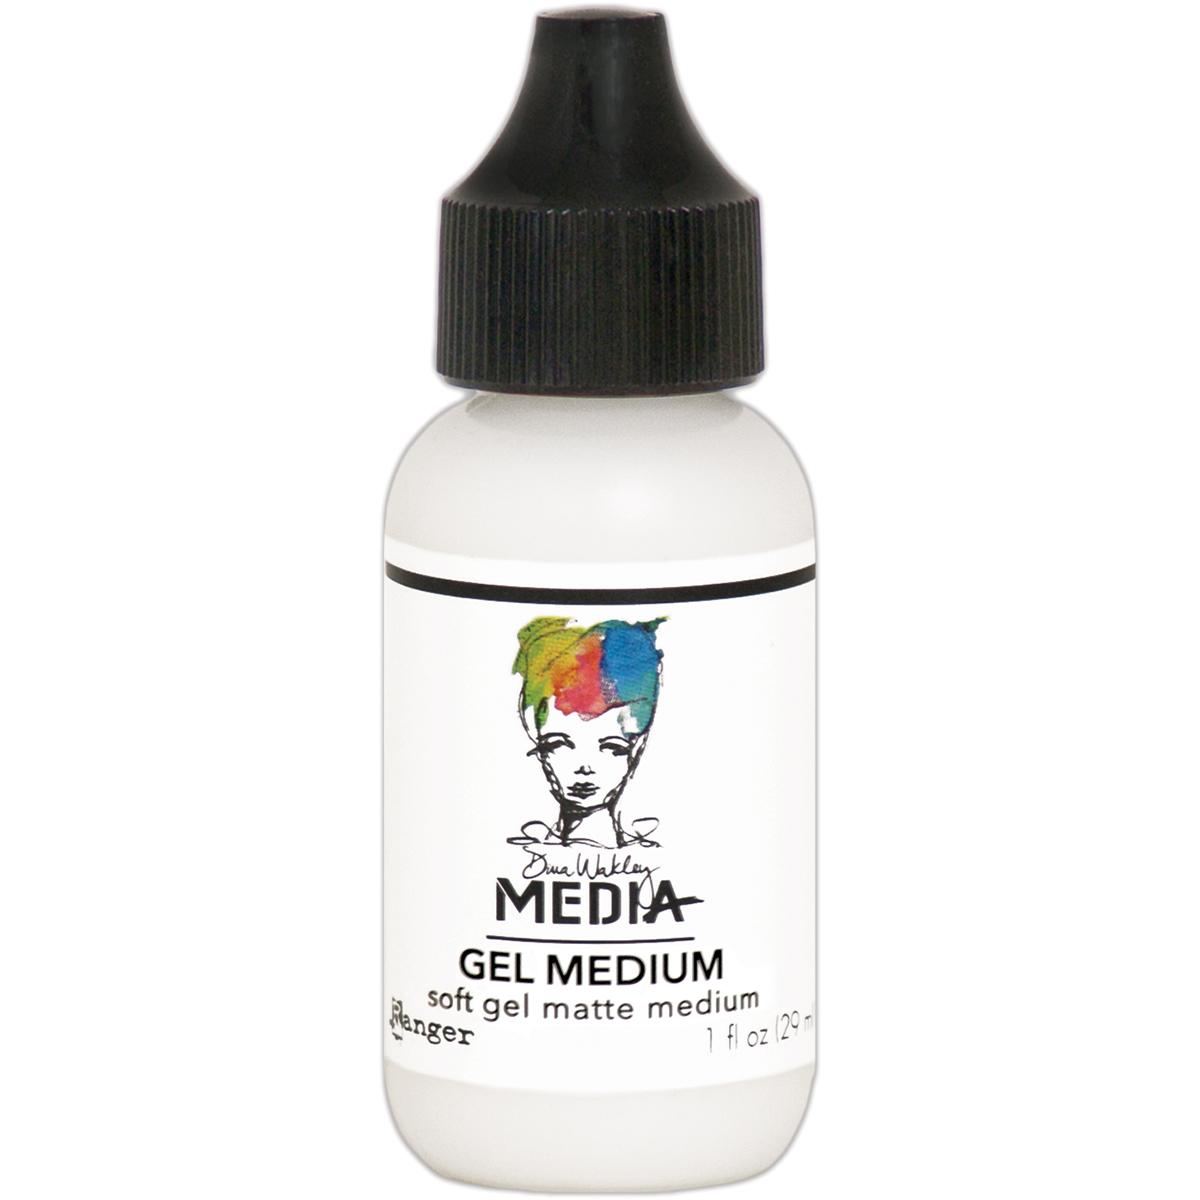 Dina Wakley Media Soft Gel Medium 1oz Tube-